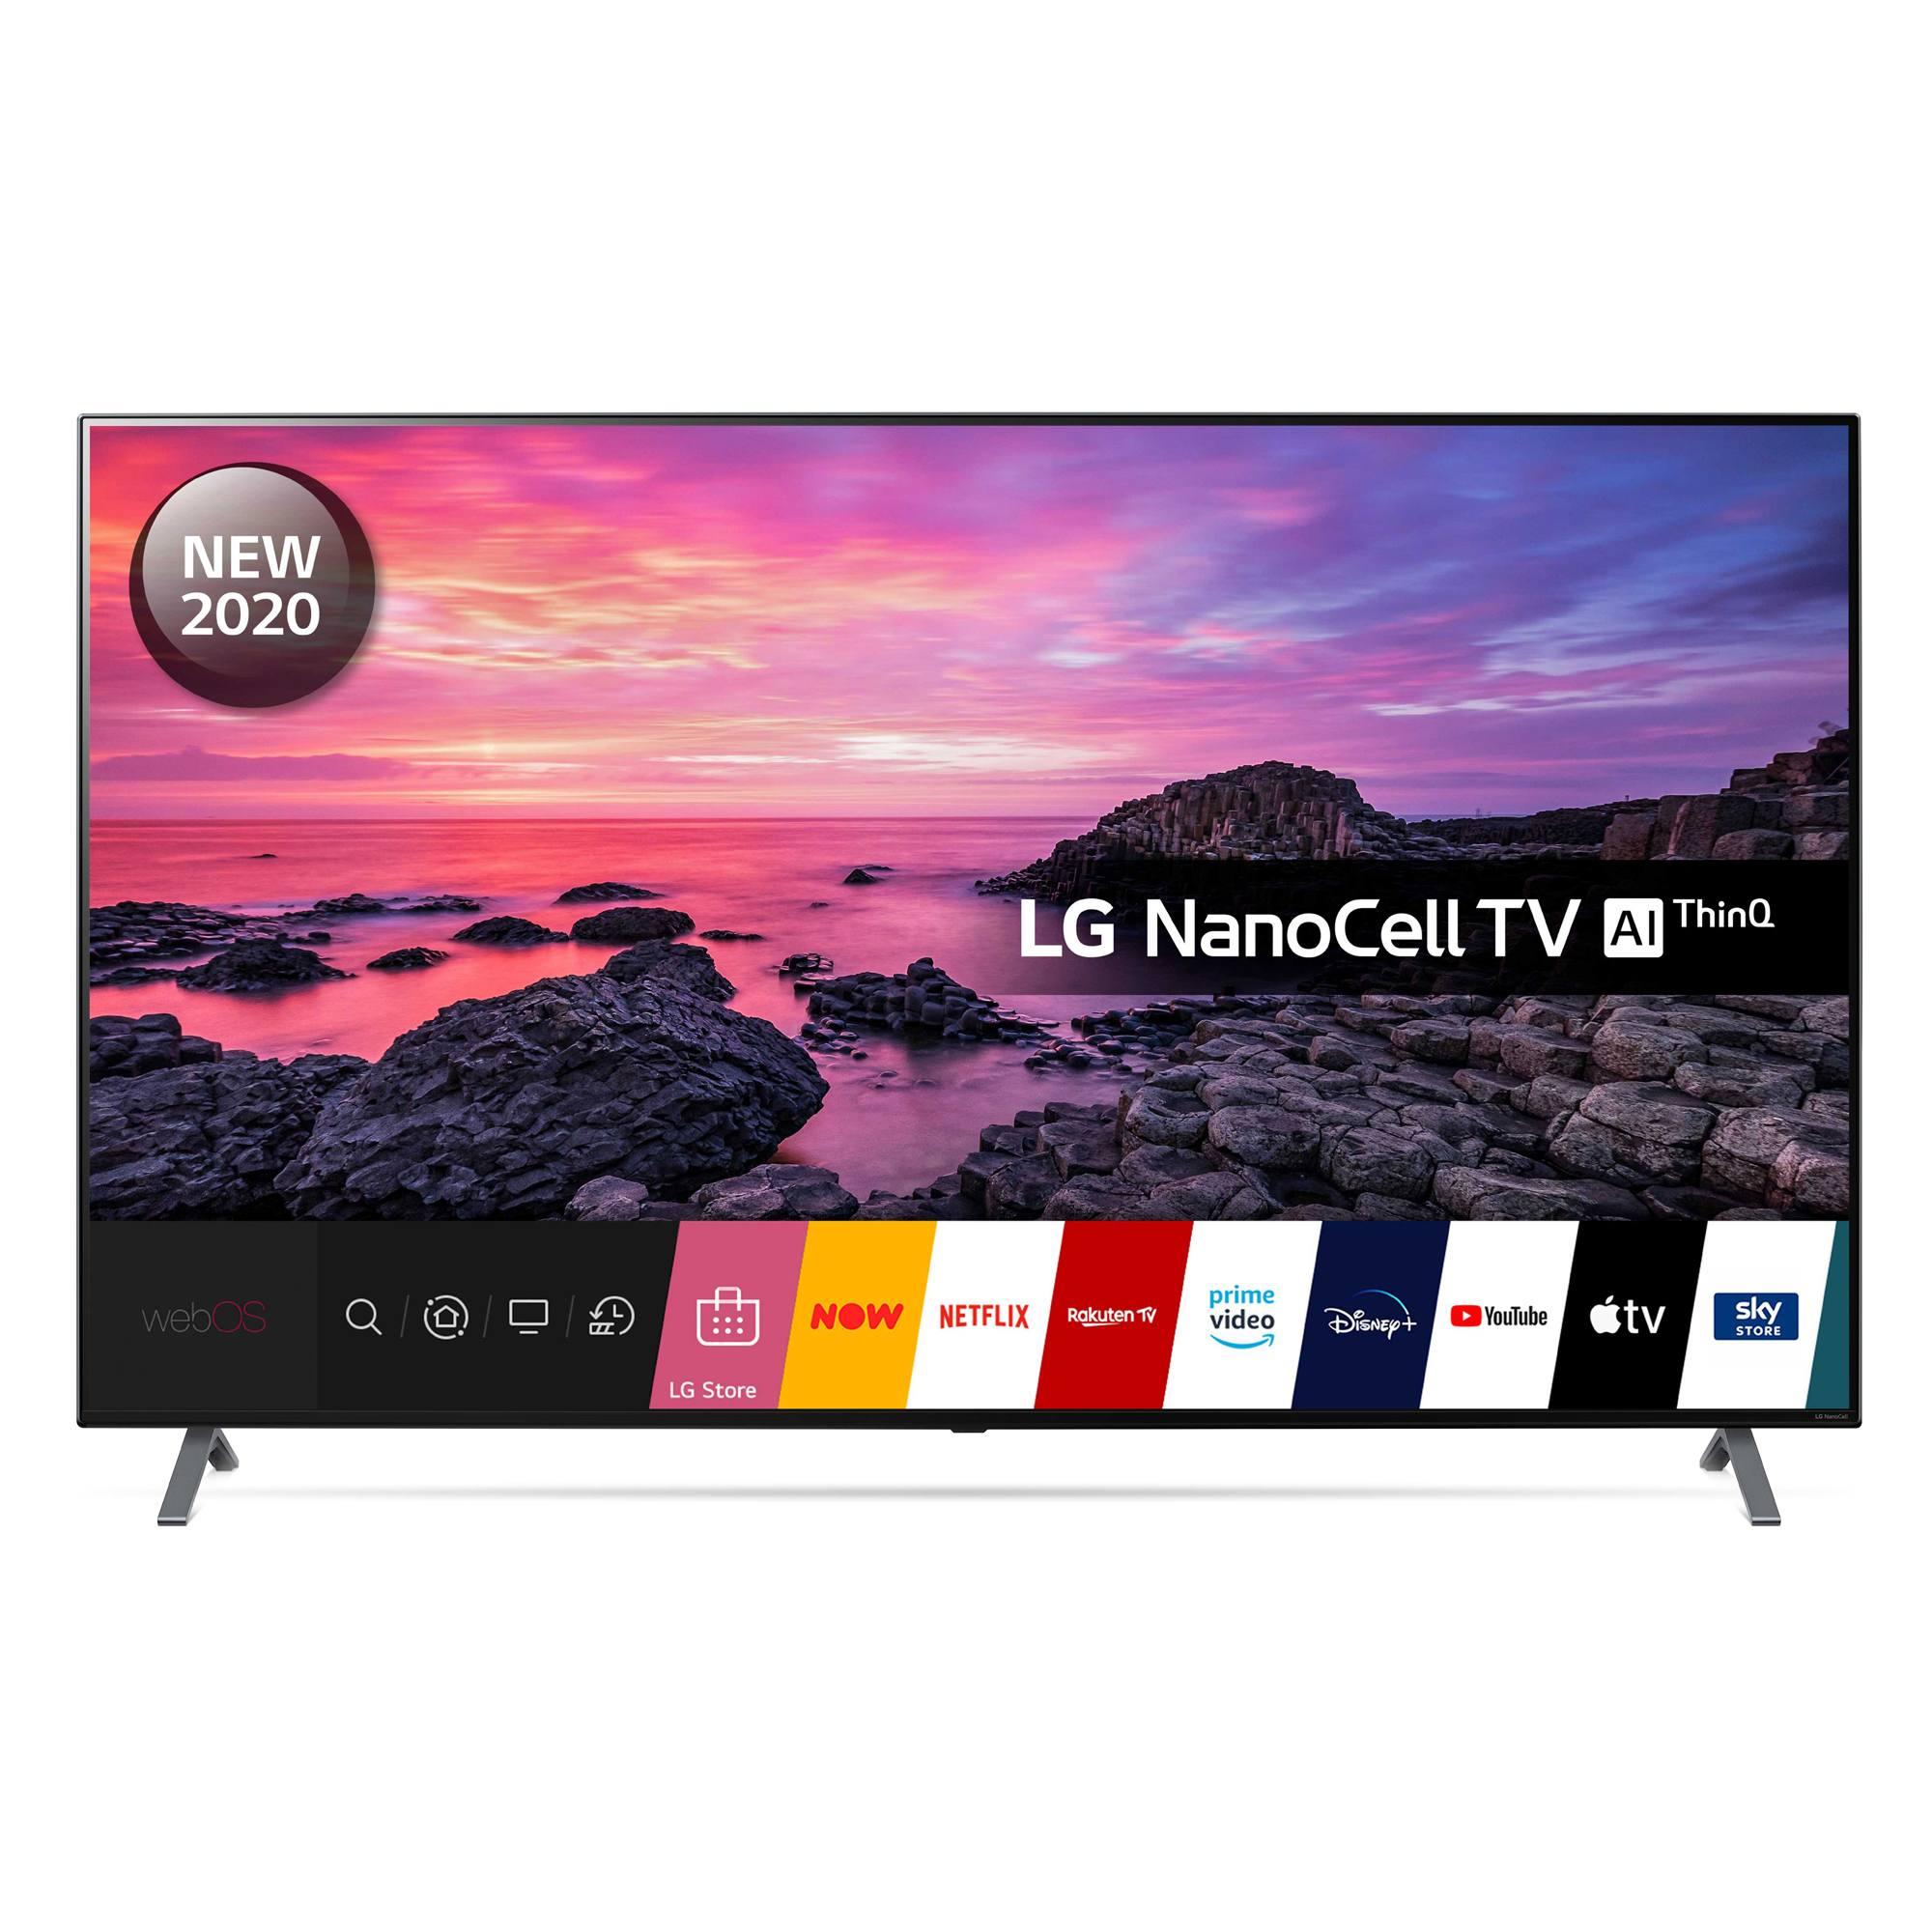 LG 75NANO906NA (2020) LED HDR NanoCell 4K Ultra HD Smart TV, 75 inch with Freeview HD/Freesat HD Dolby Atmos £1,199 at Hughes